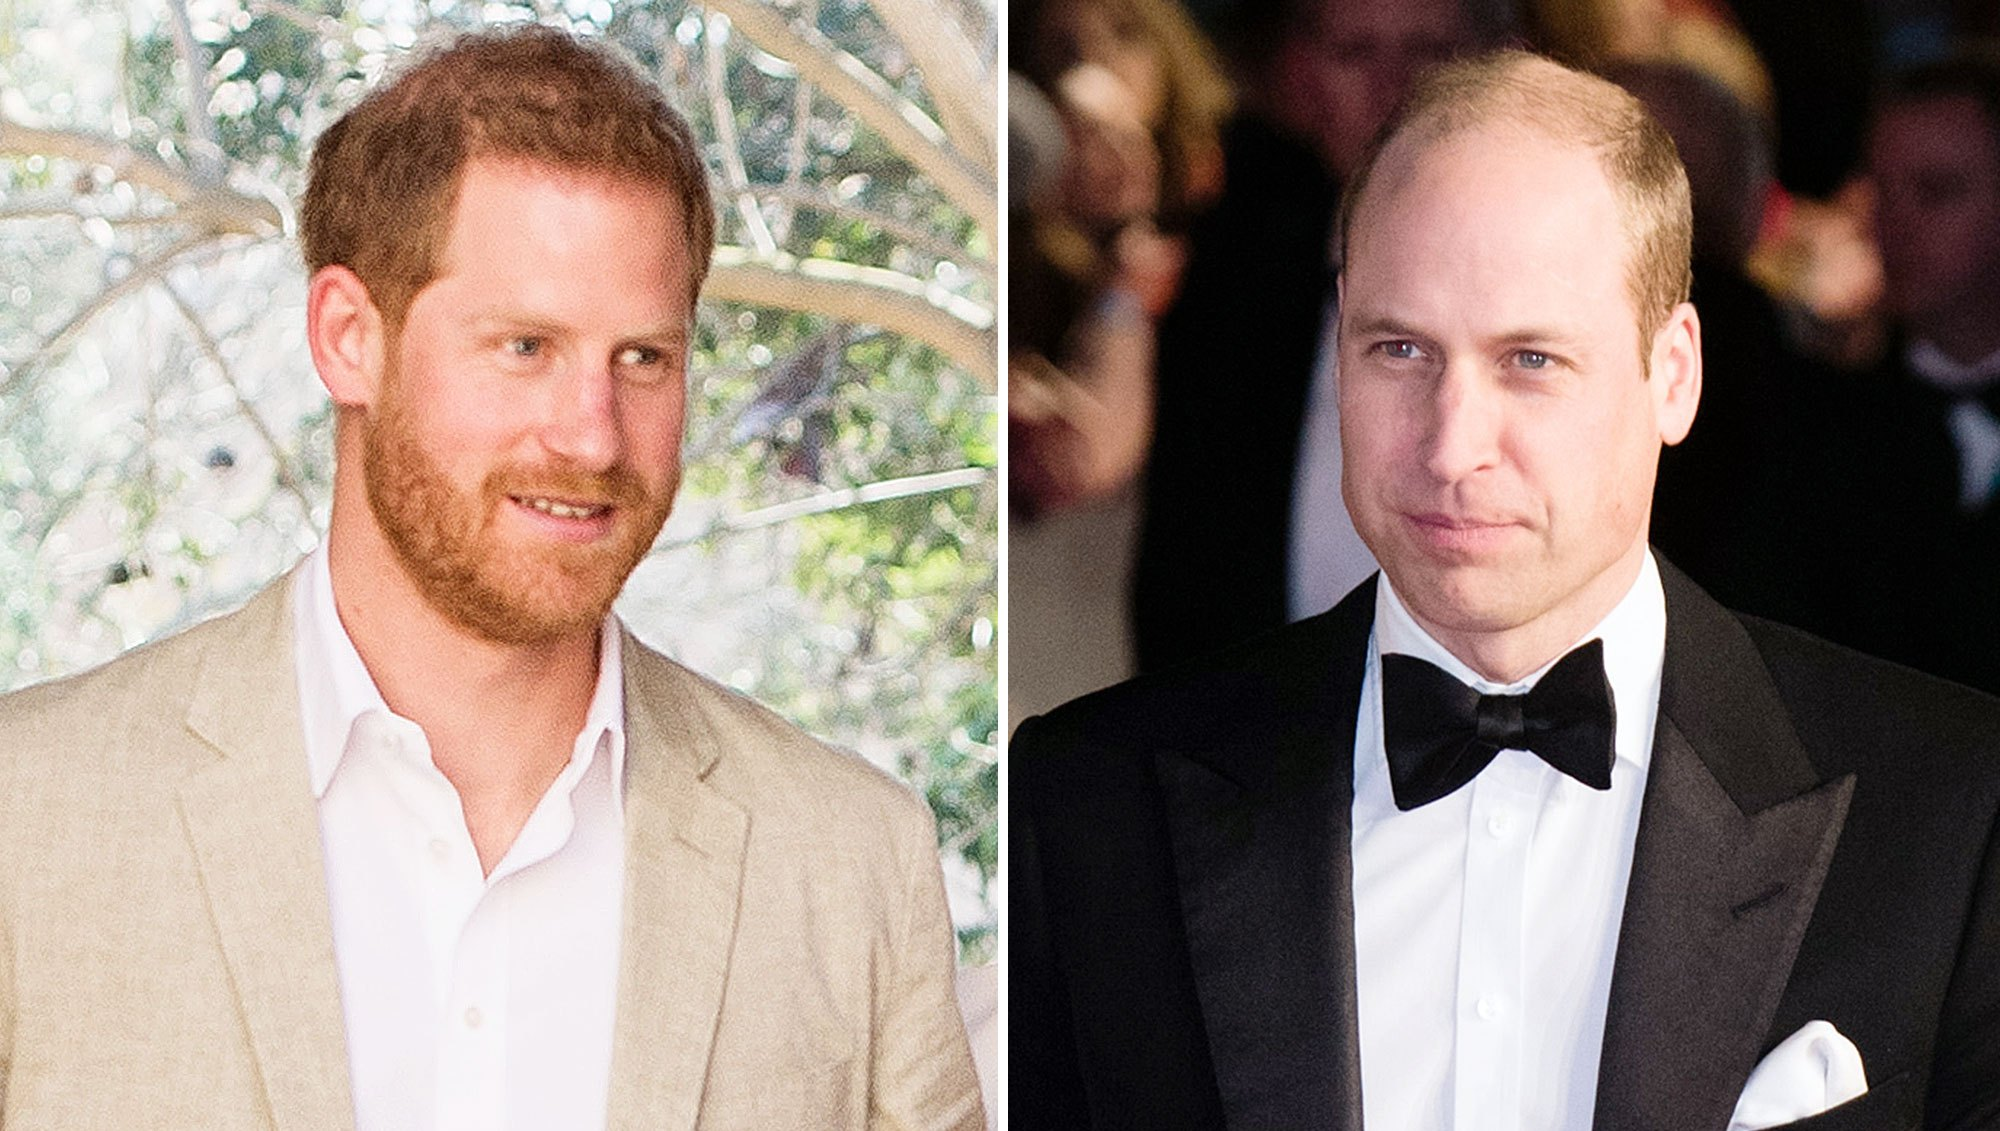 Prince Harry Prince William Split Royal Households